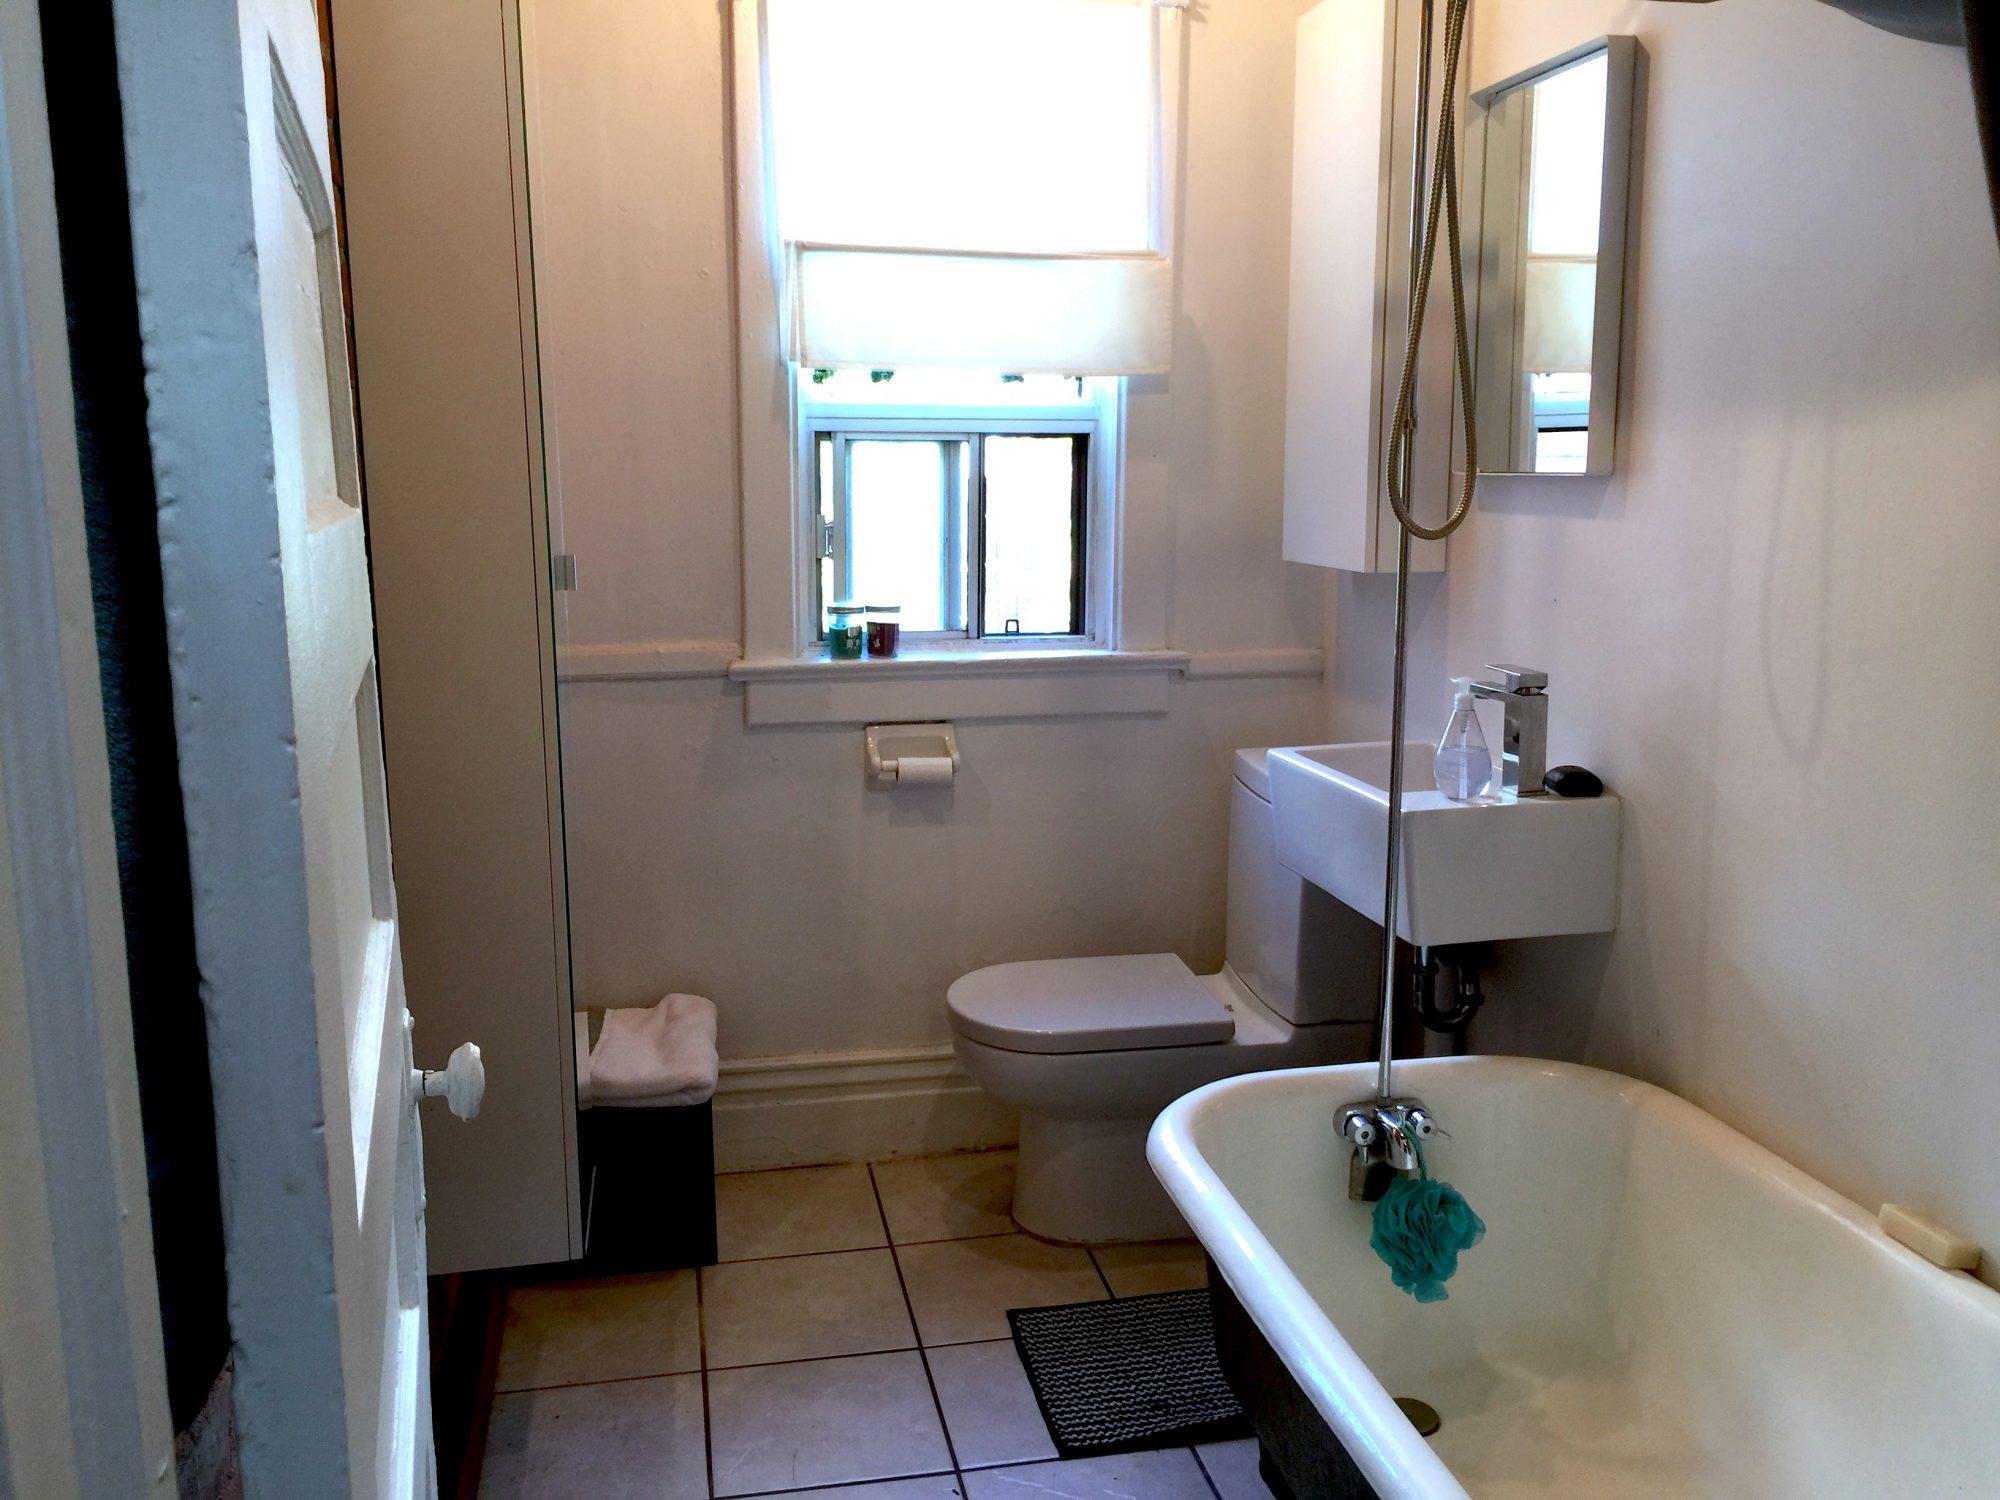 tornoto-apartment-for-rent-917-ossington-avenue-8